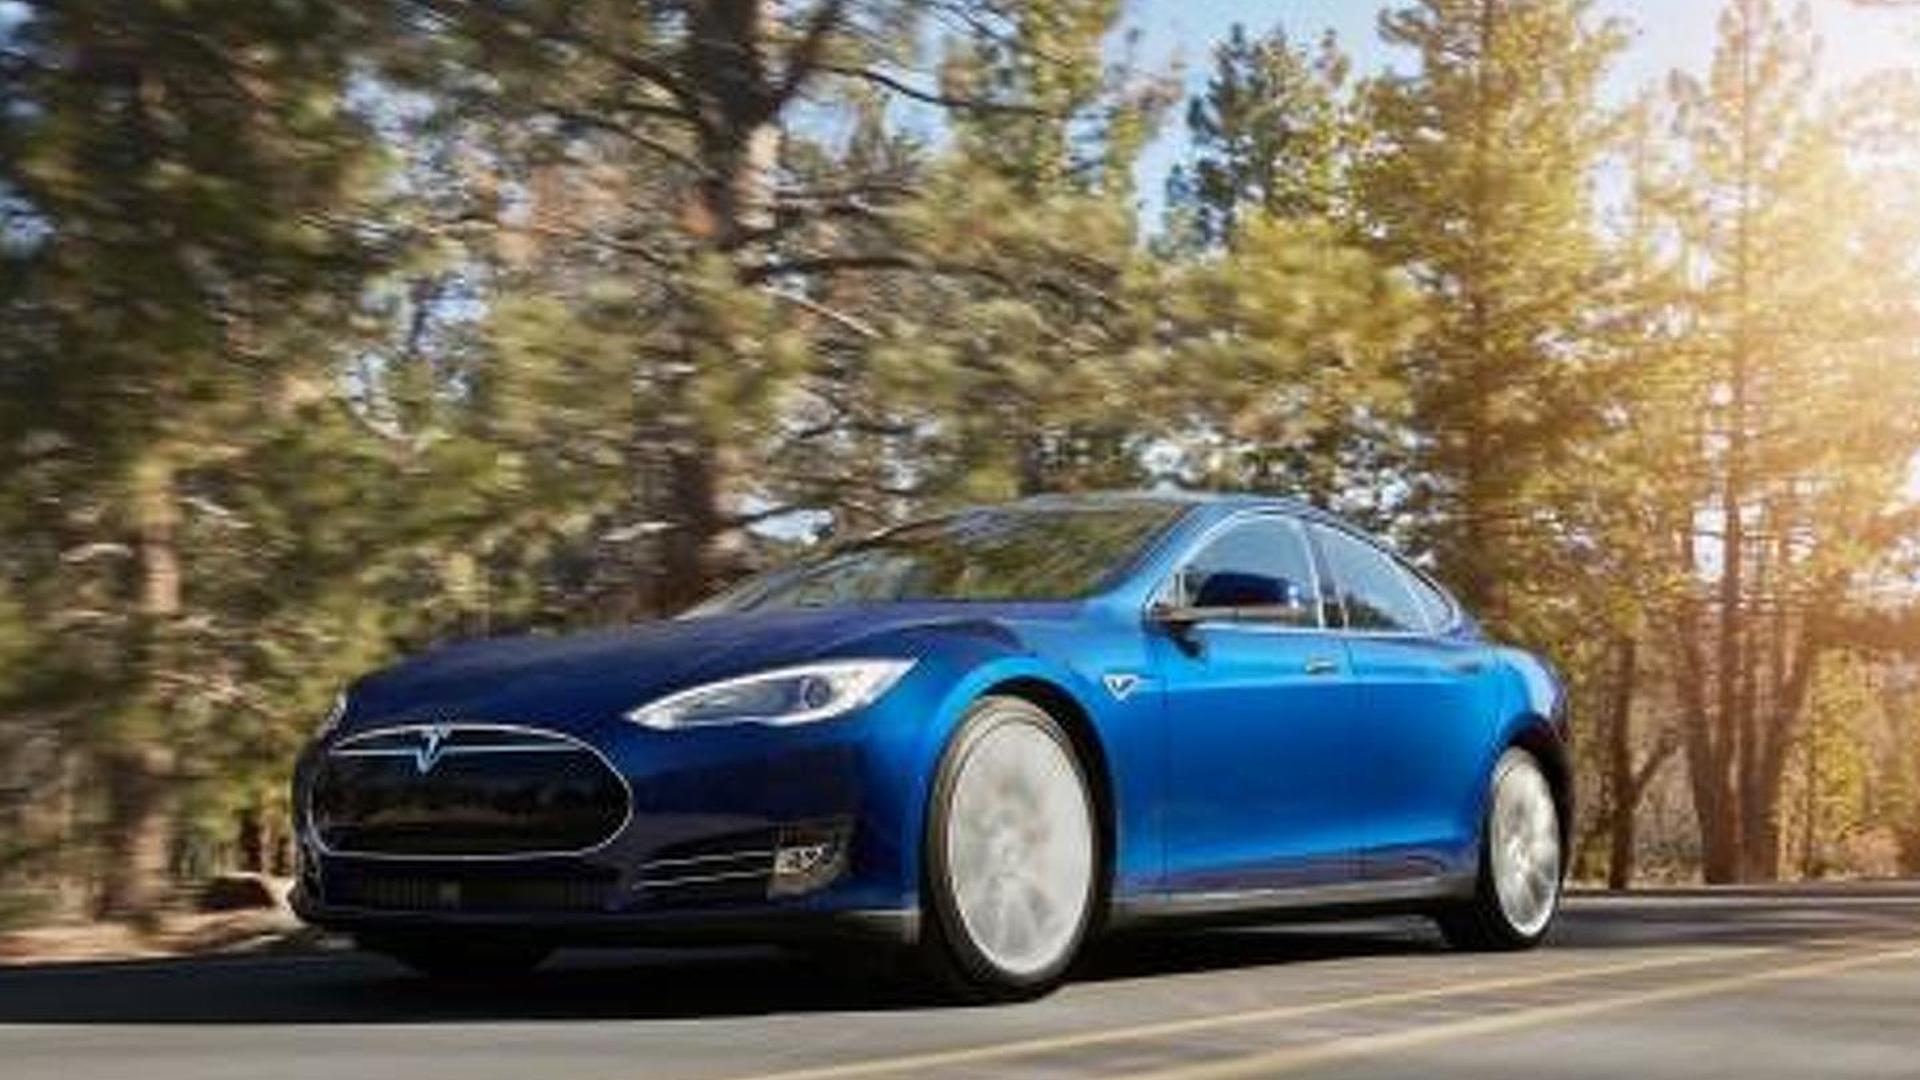 Elon Musk considers Apple the Tesla Graveyard of fired employees